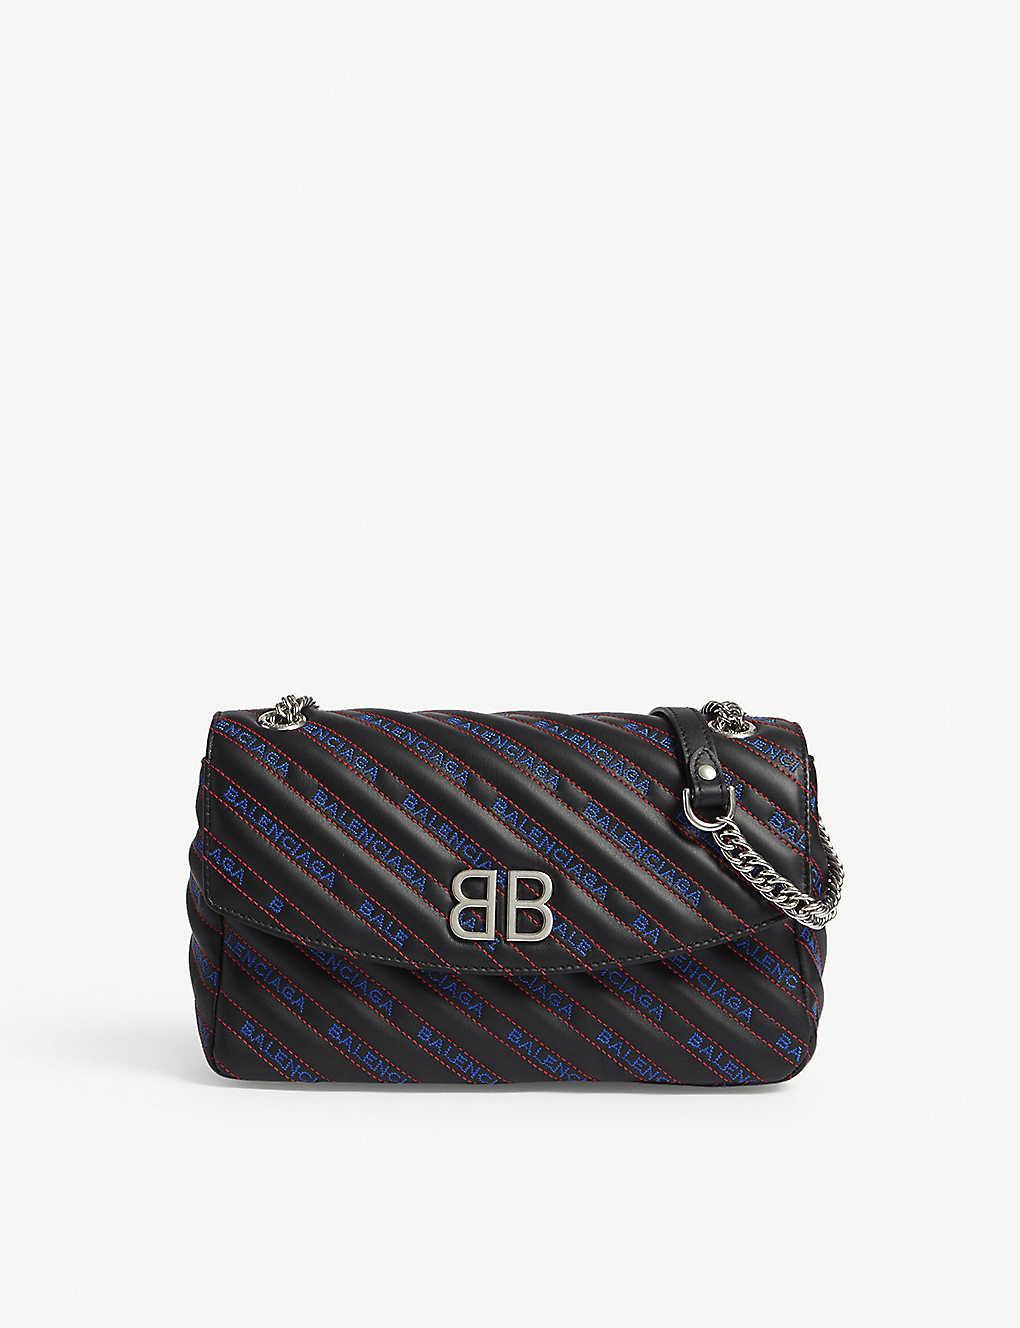 7c12679c59b2fb BALENCIAGA - BB Round leather shoulder bag   Selfridges.com